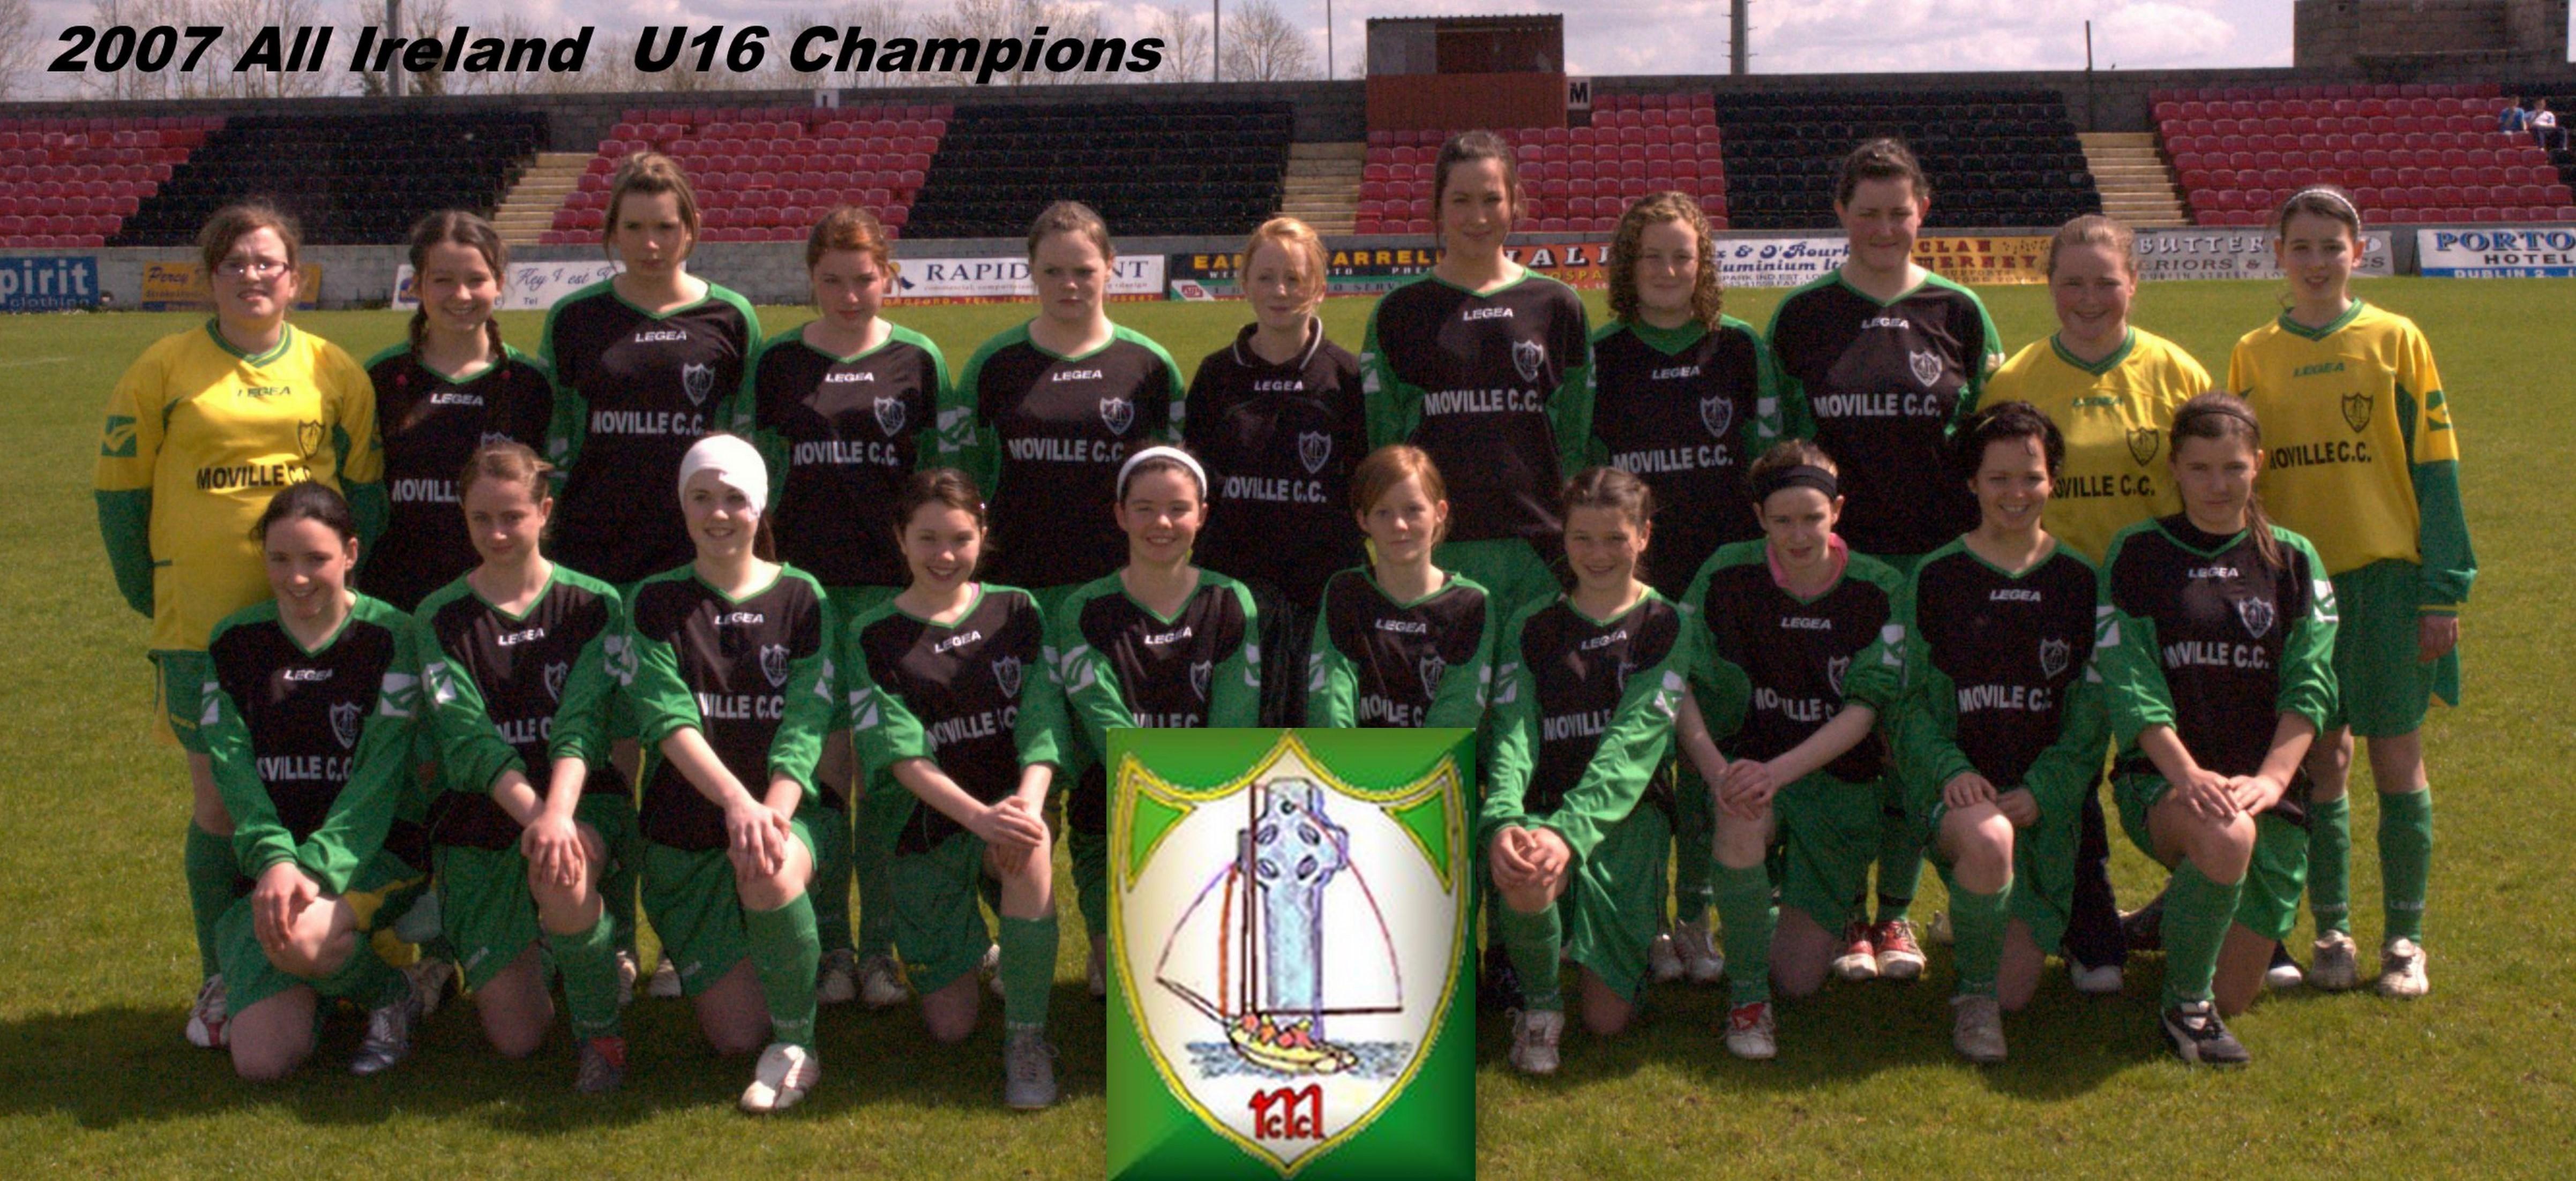 2007 all Ireland